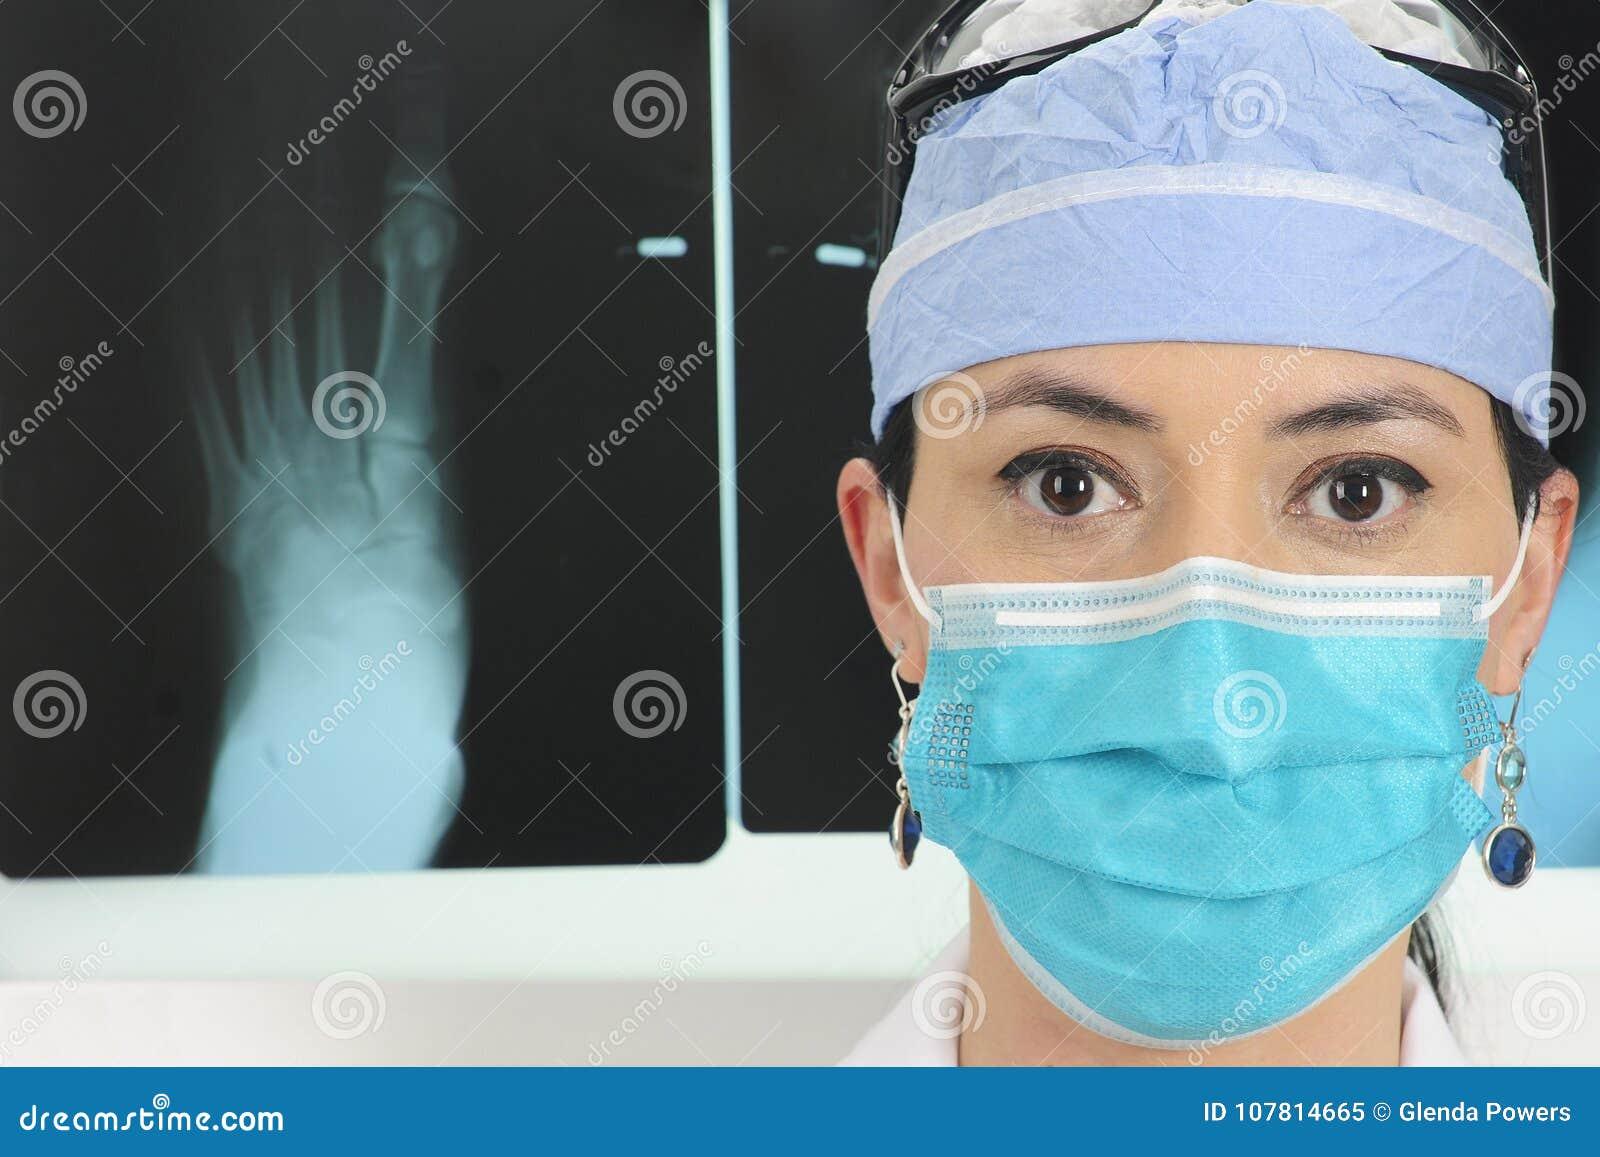 Хирург с рентгеновскими снимками